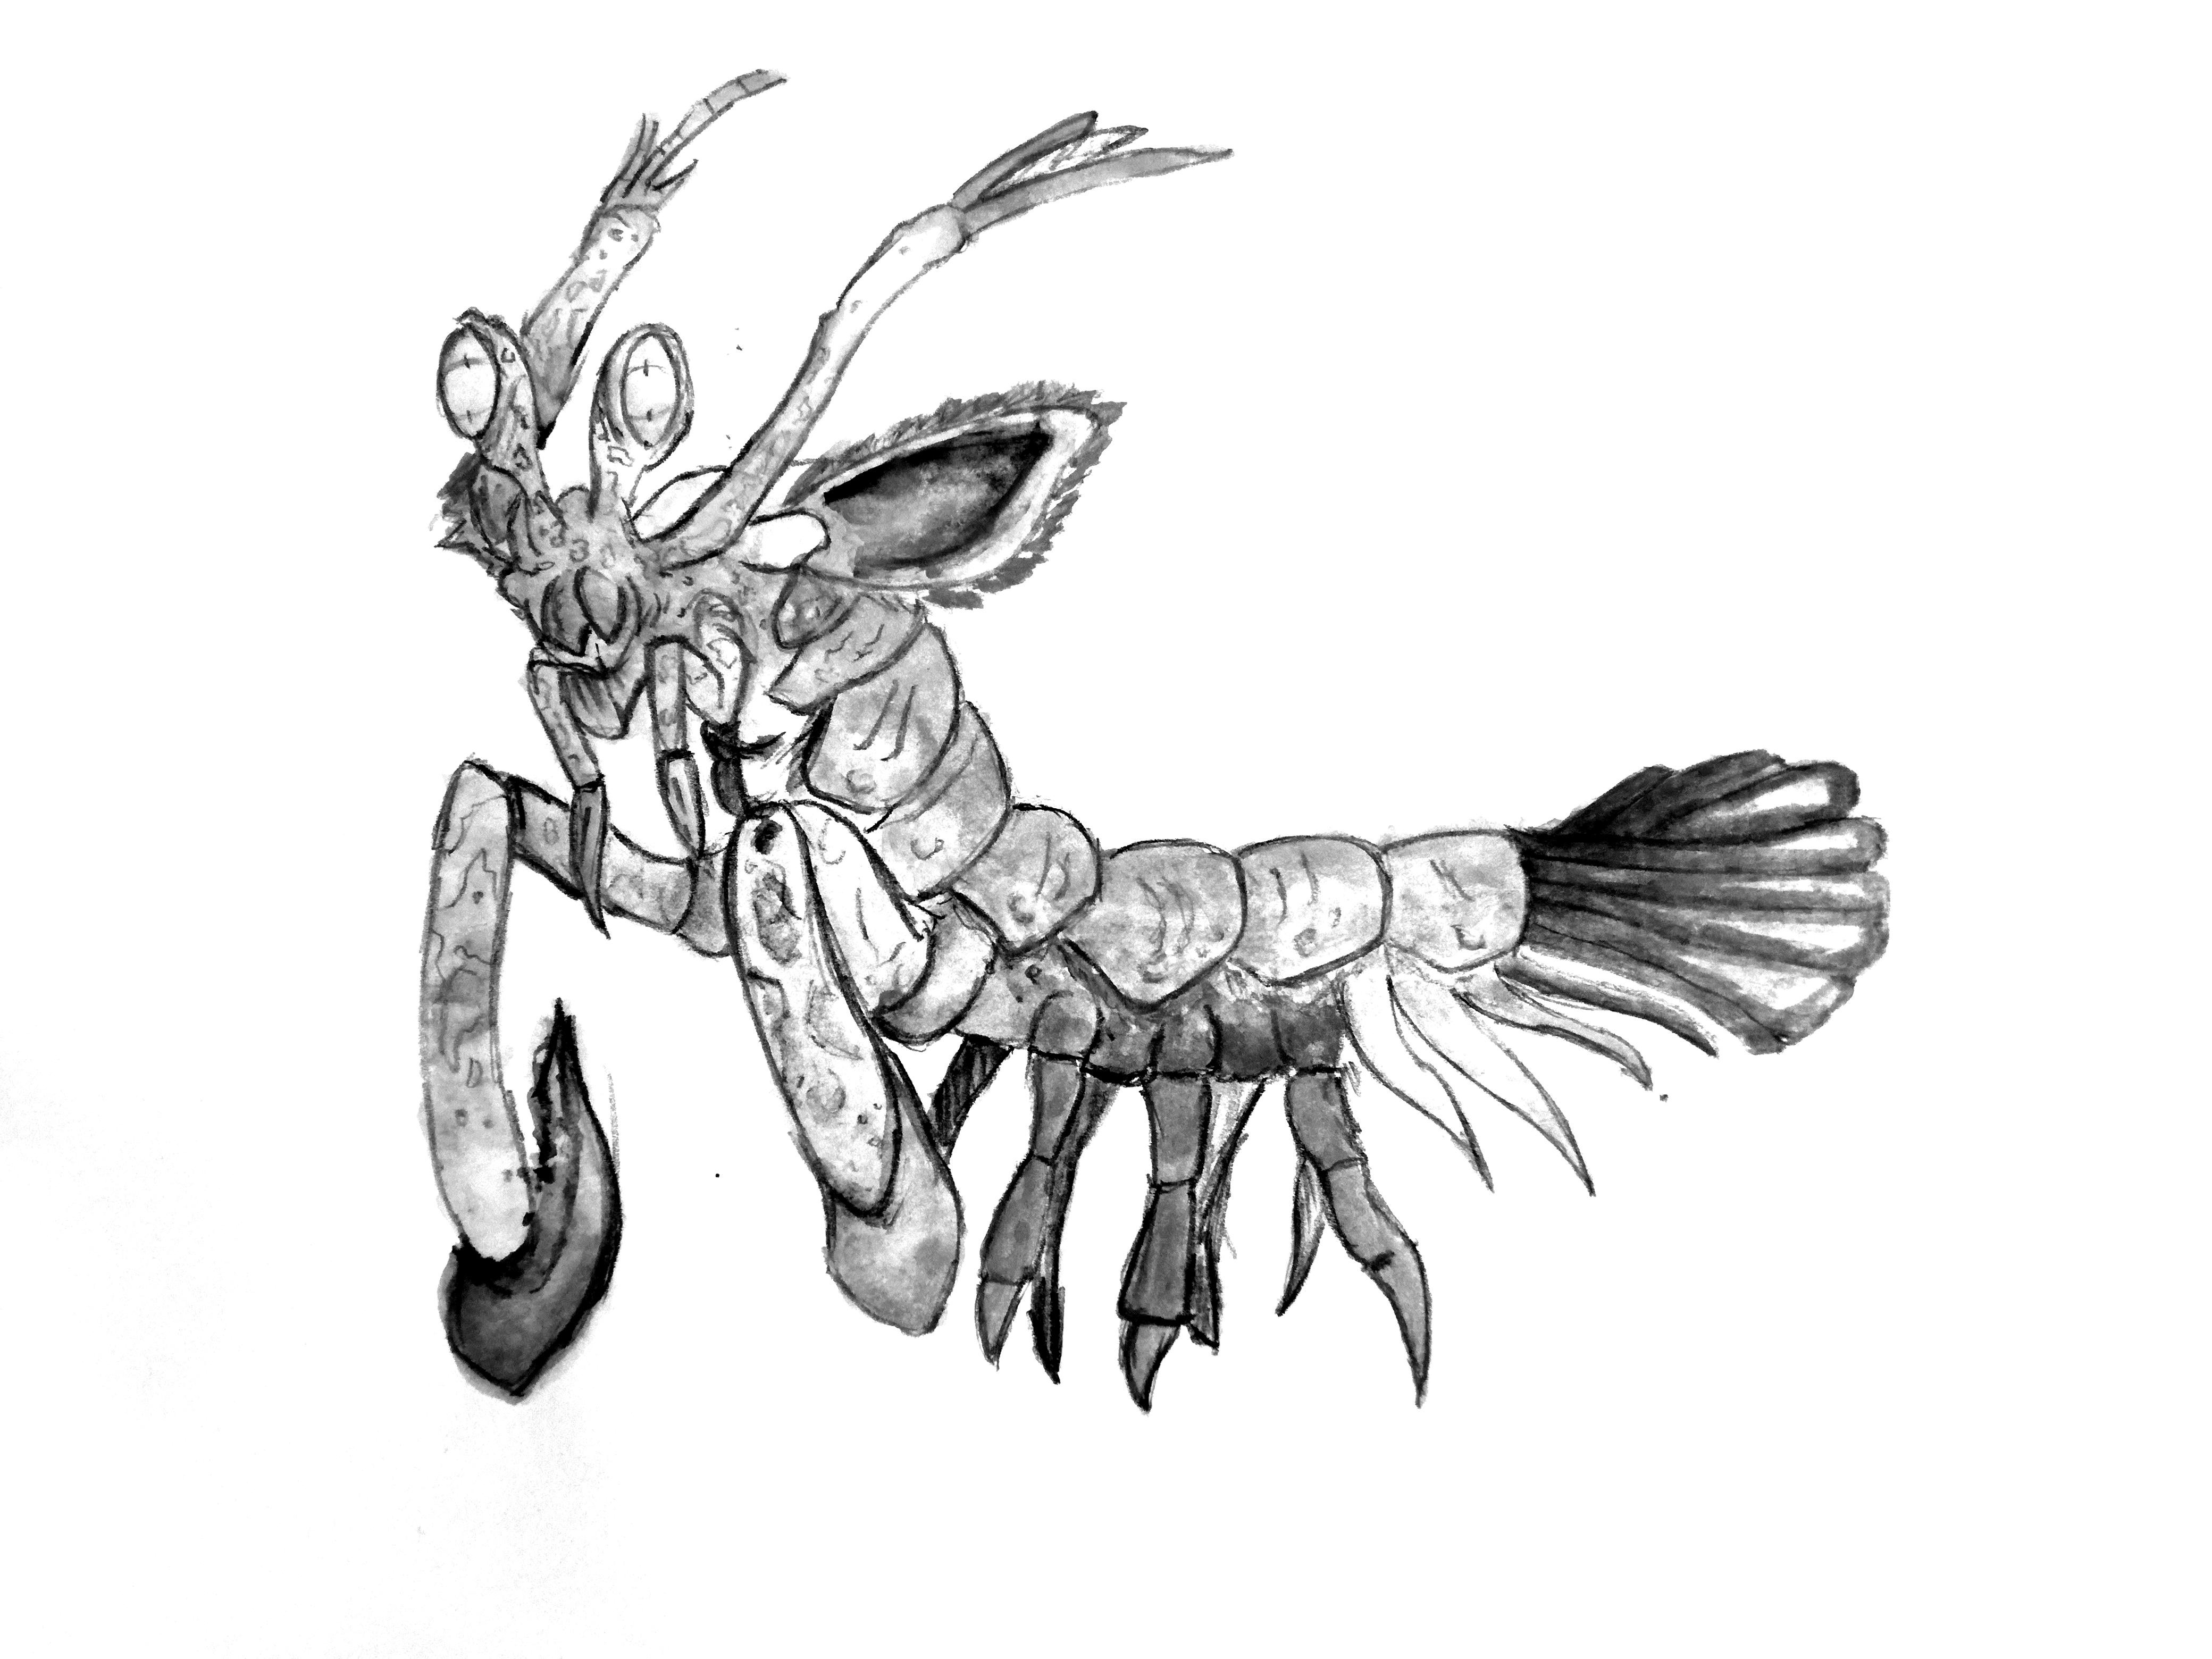 4160x3120 The Mantis Shrimp Decent Spread